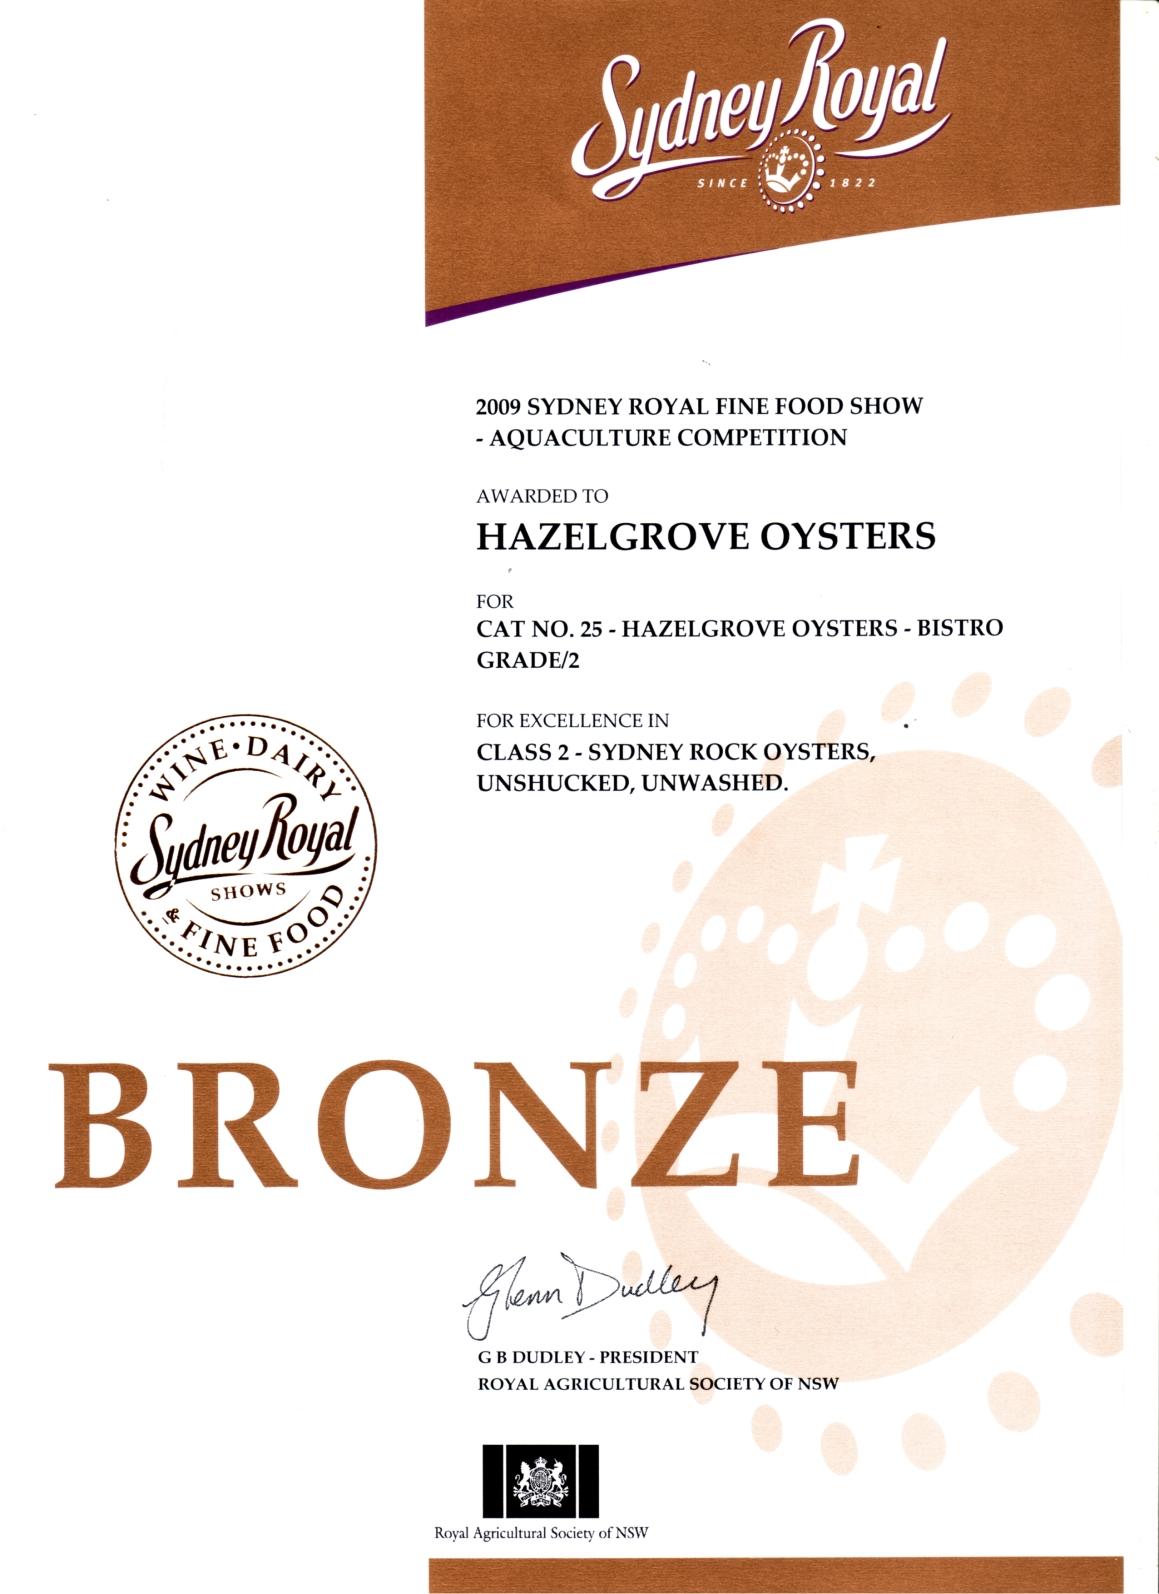 Bronze+2009